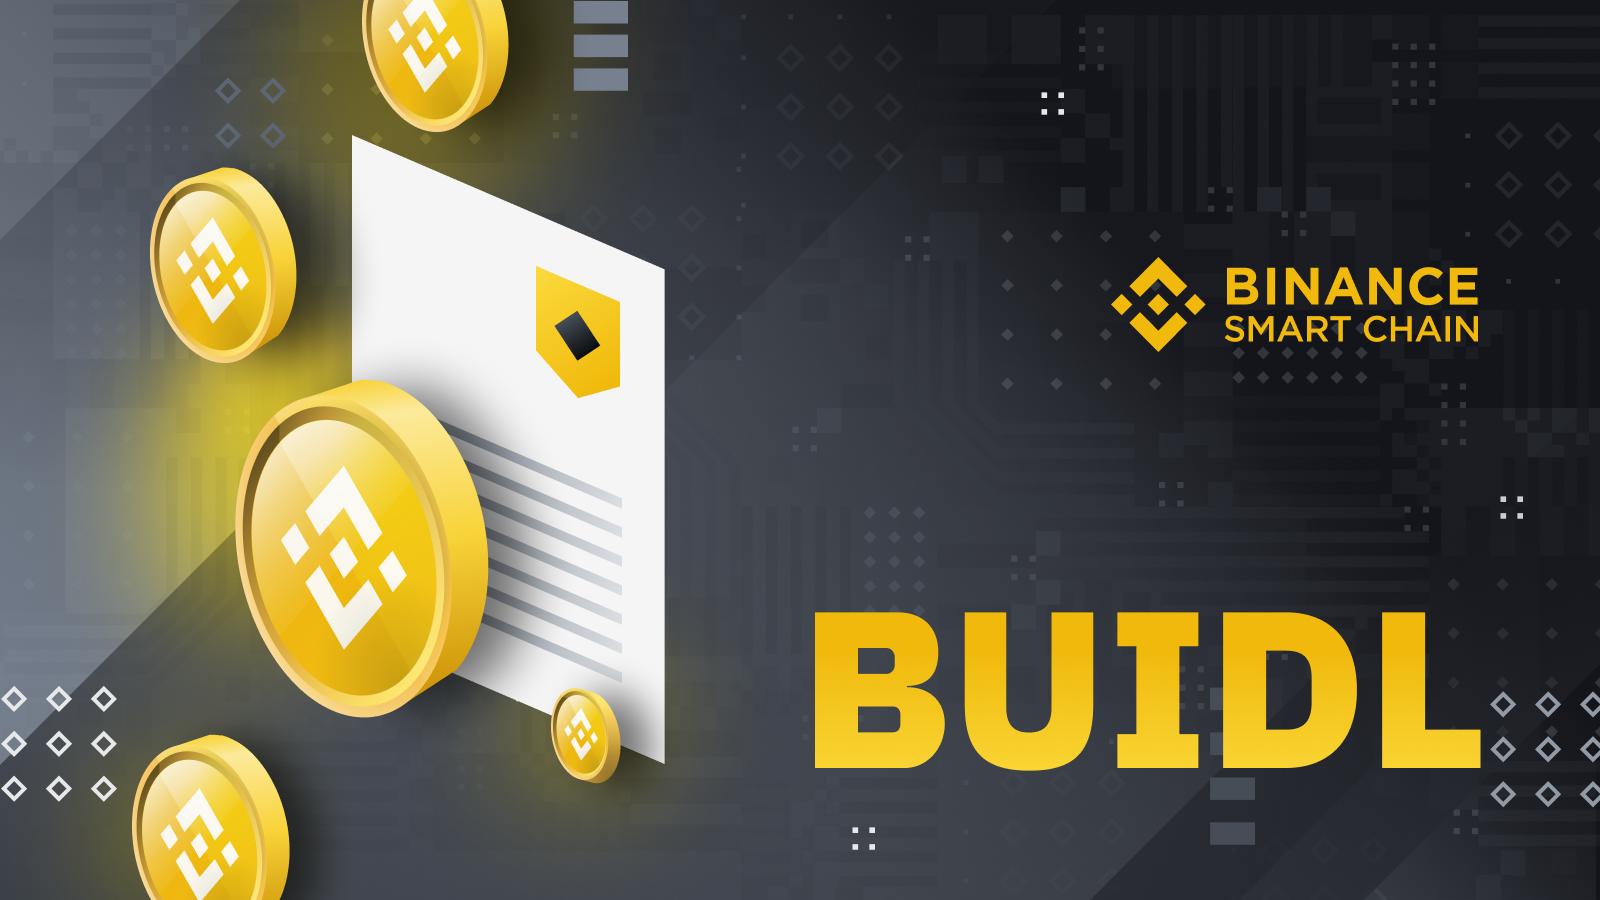 BUIDL Reward Program Updates - November